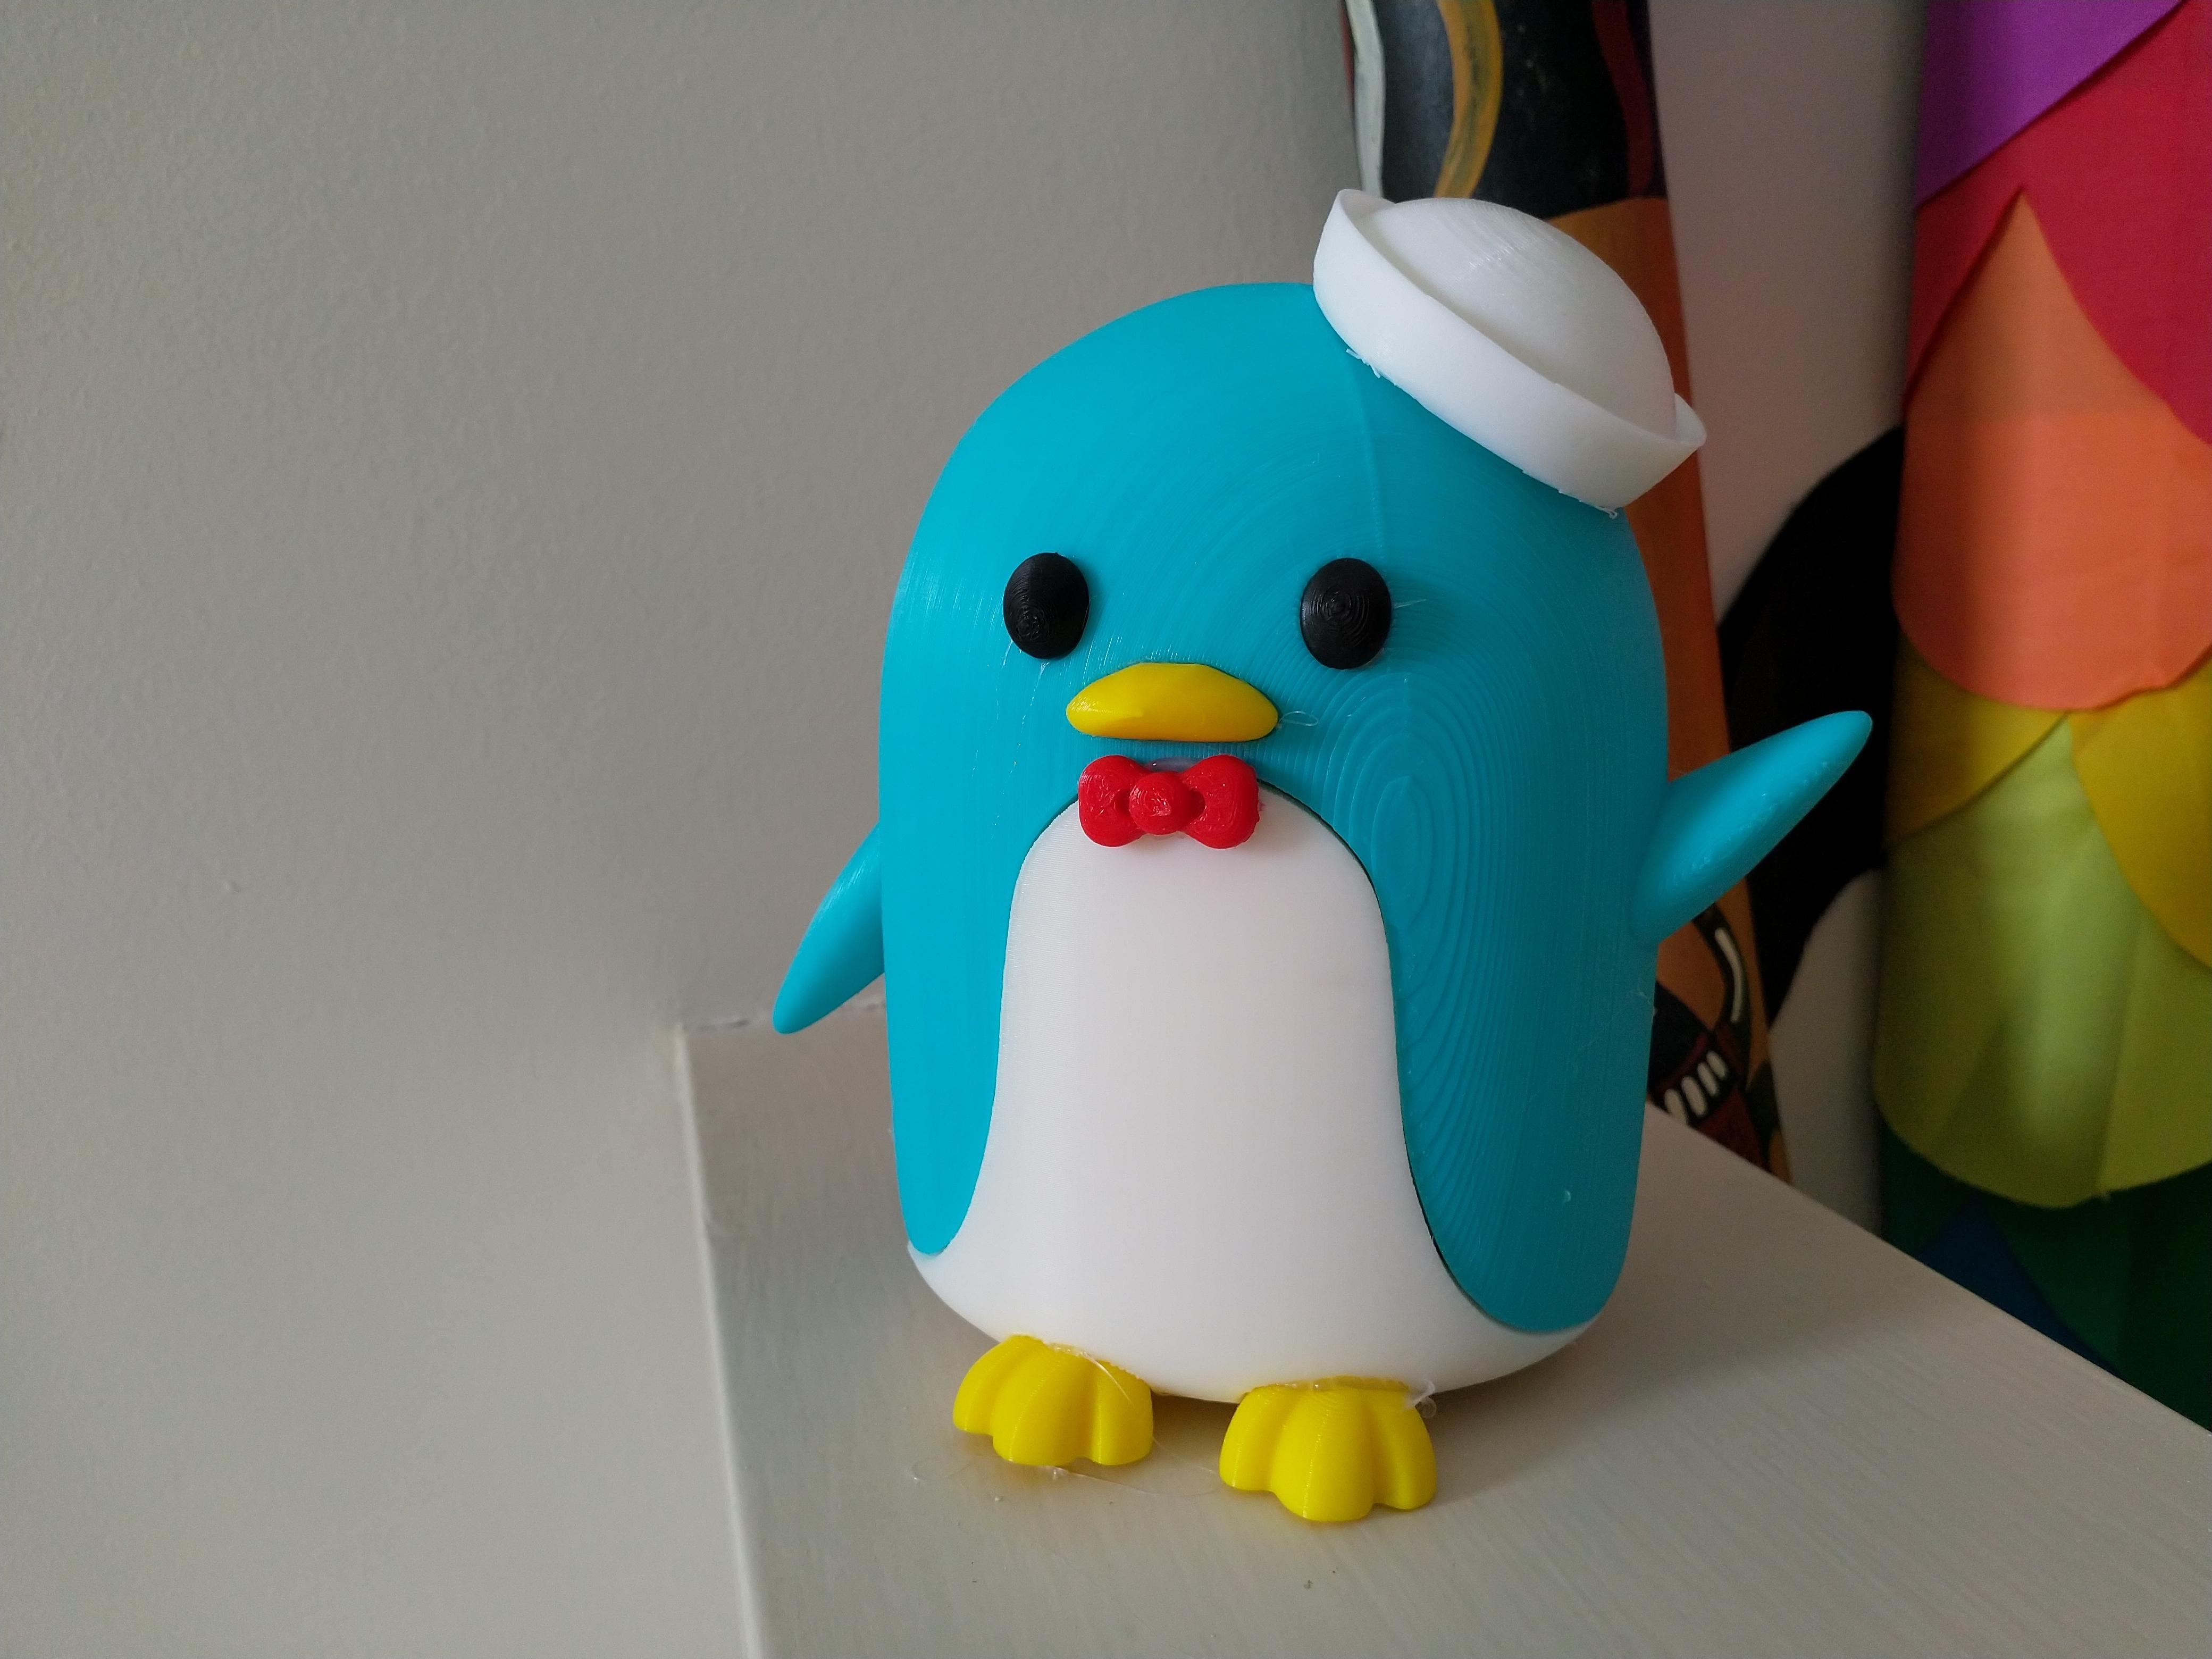 IMG_20200205_140718.jpg Télécharger fichier STL gratuit Tuxedo Sam (l'ami de Hello Kitty) Pingouin (タキシードサム, Takishīdosamu) • Objet pour impression 3D, Jangie